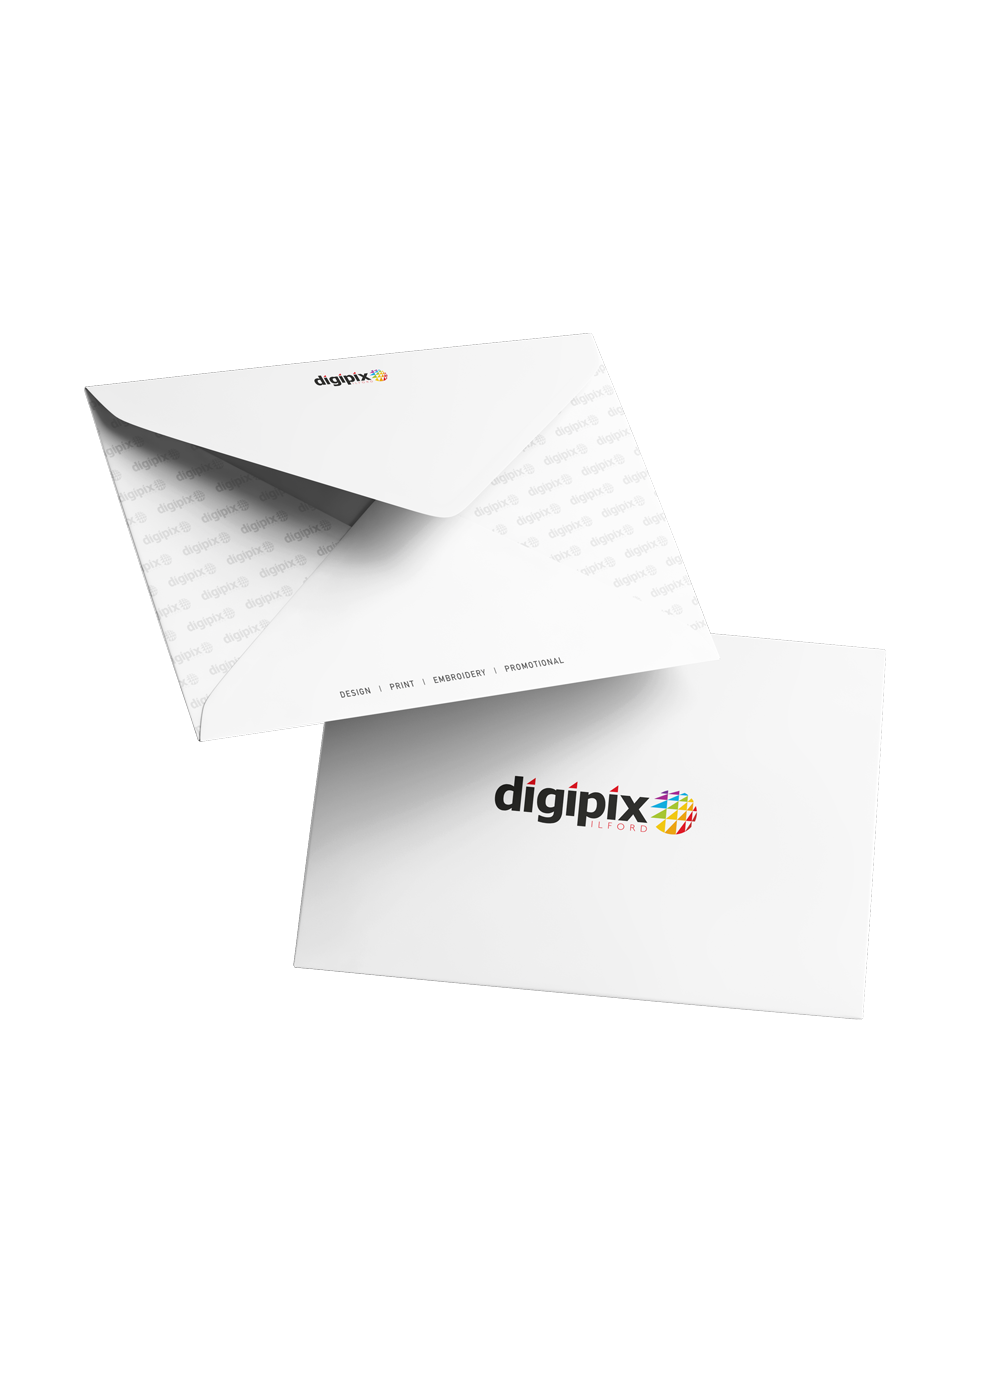 Digipix Envelopes